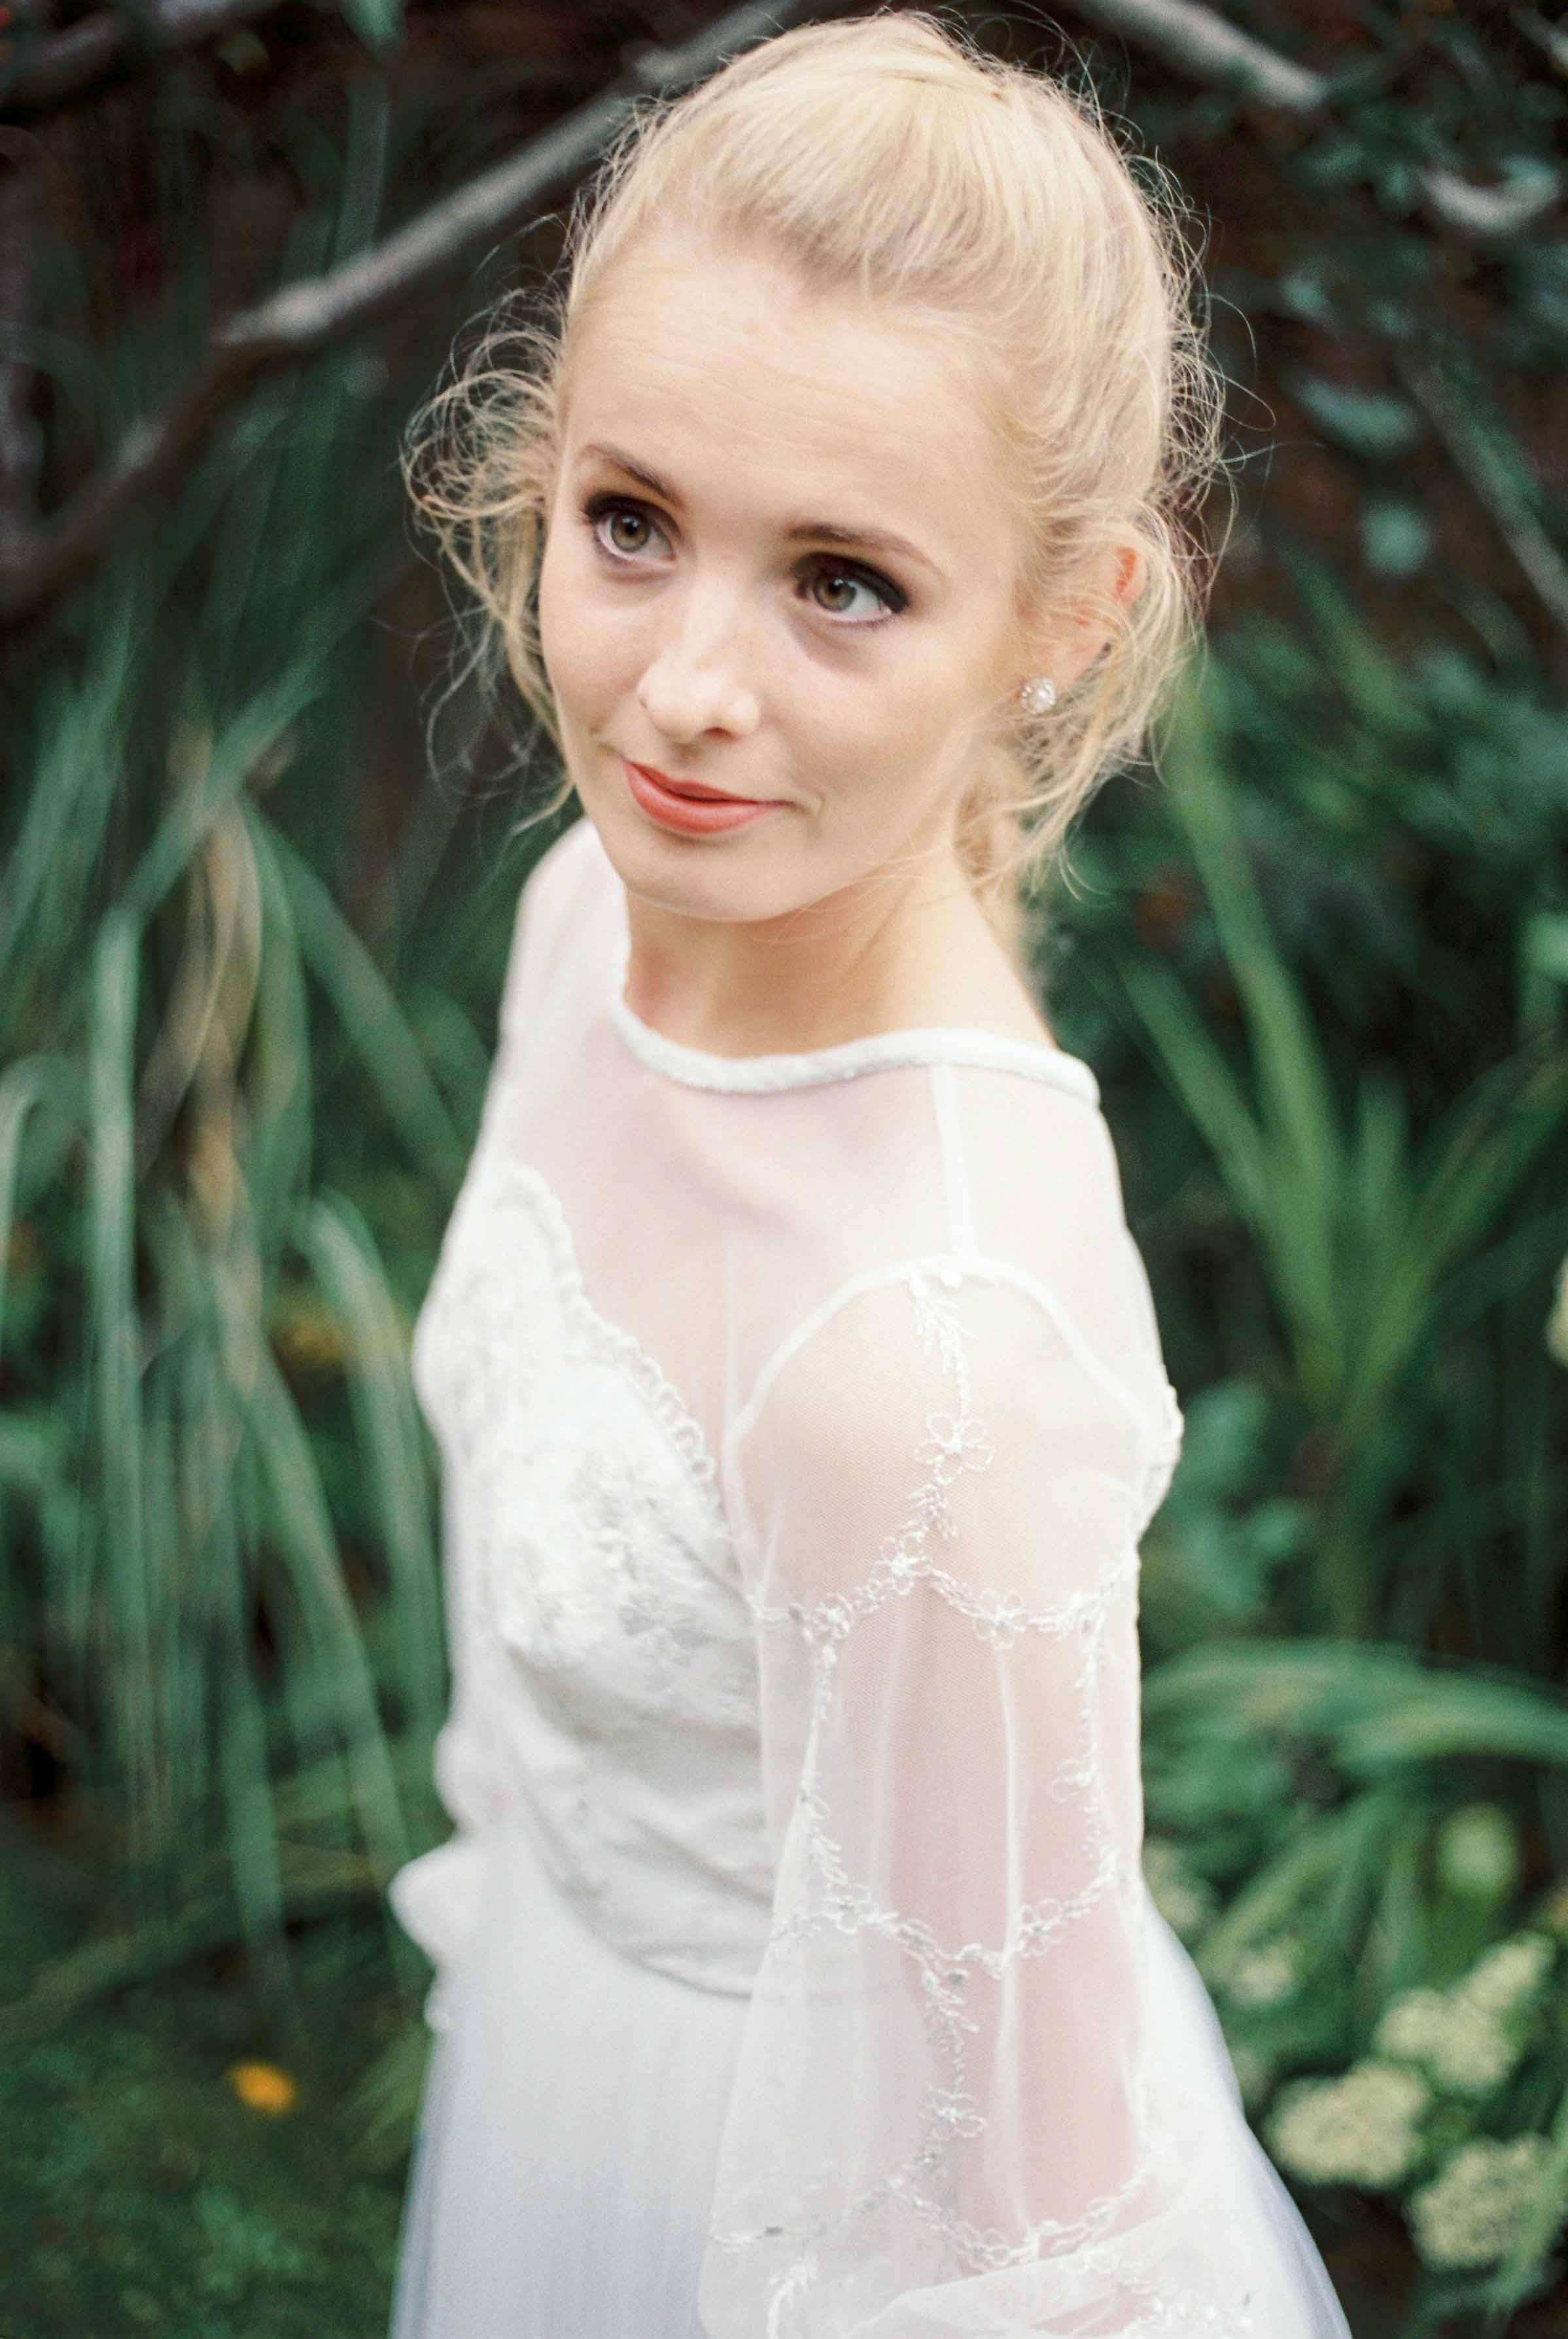 dorset-fine-art-wedding-photographer_amelia_carmencita_lores-24-of-24